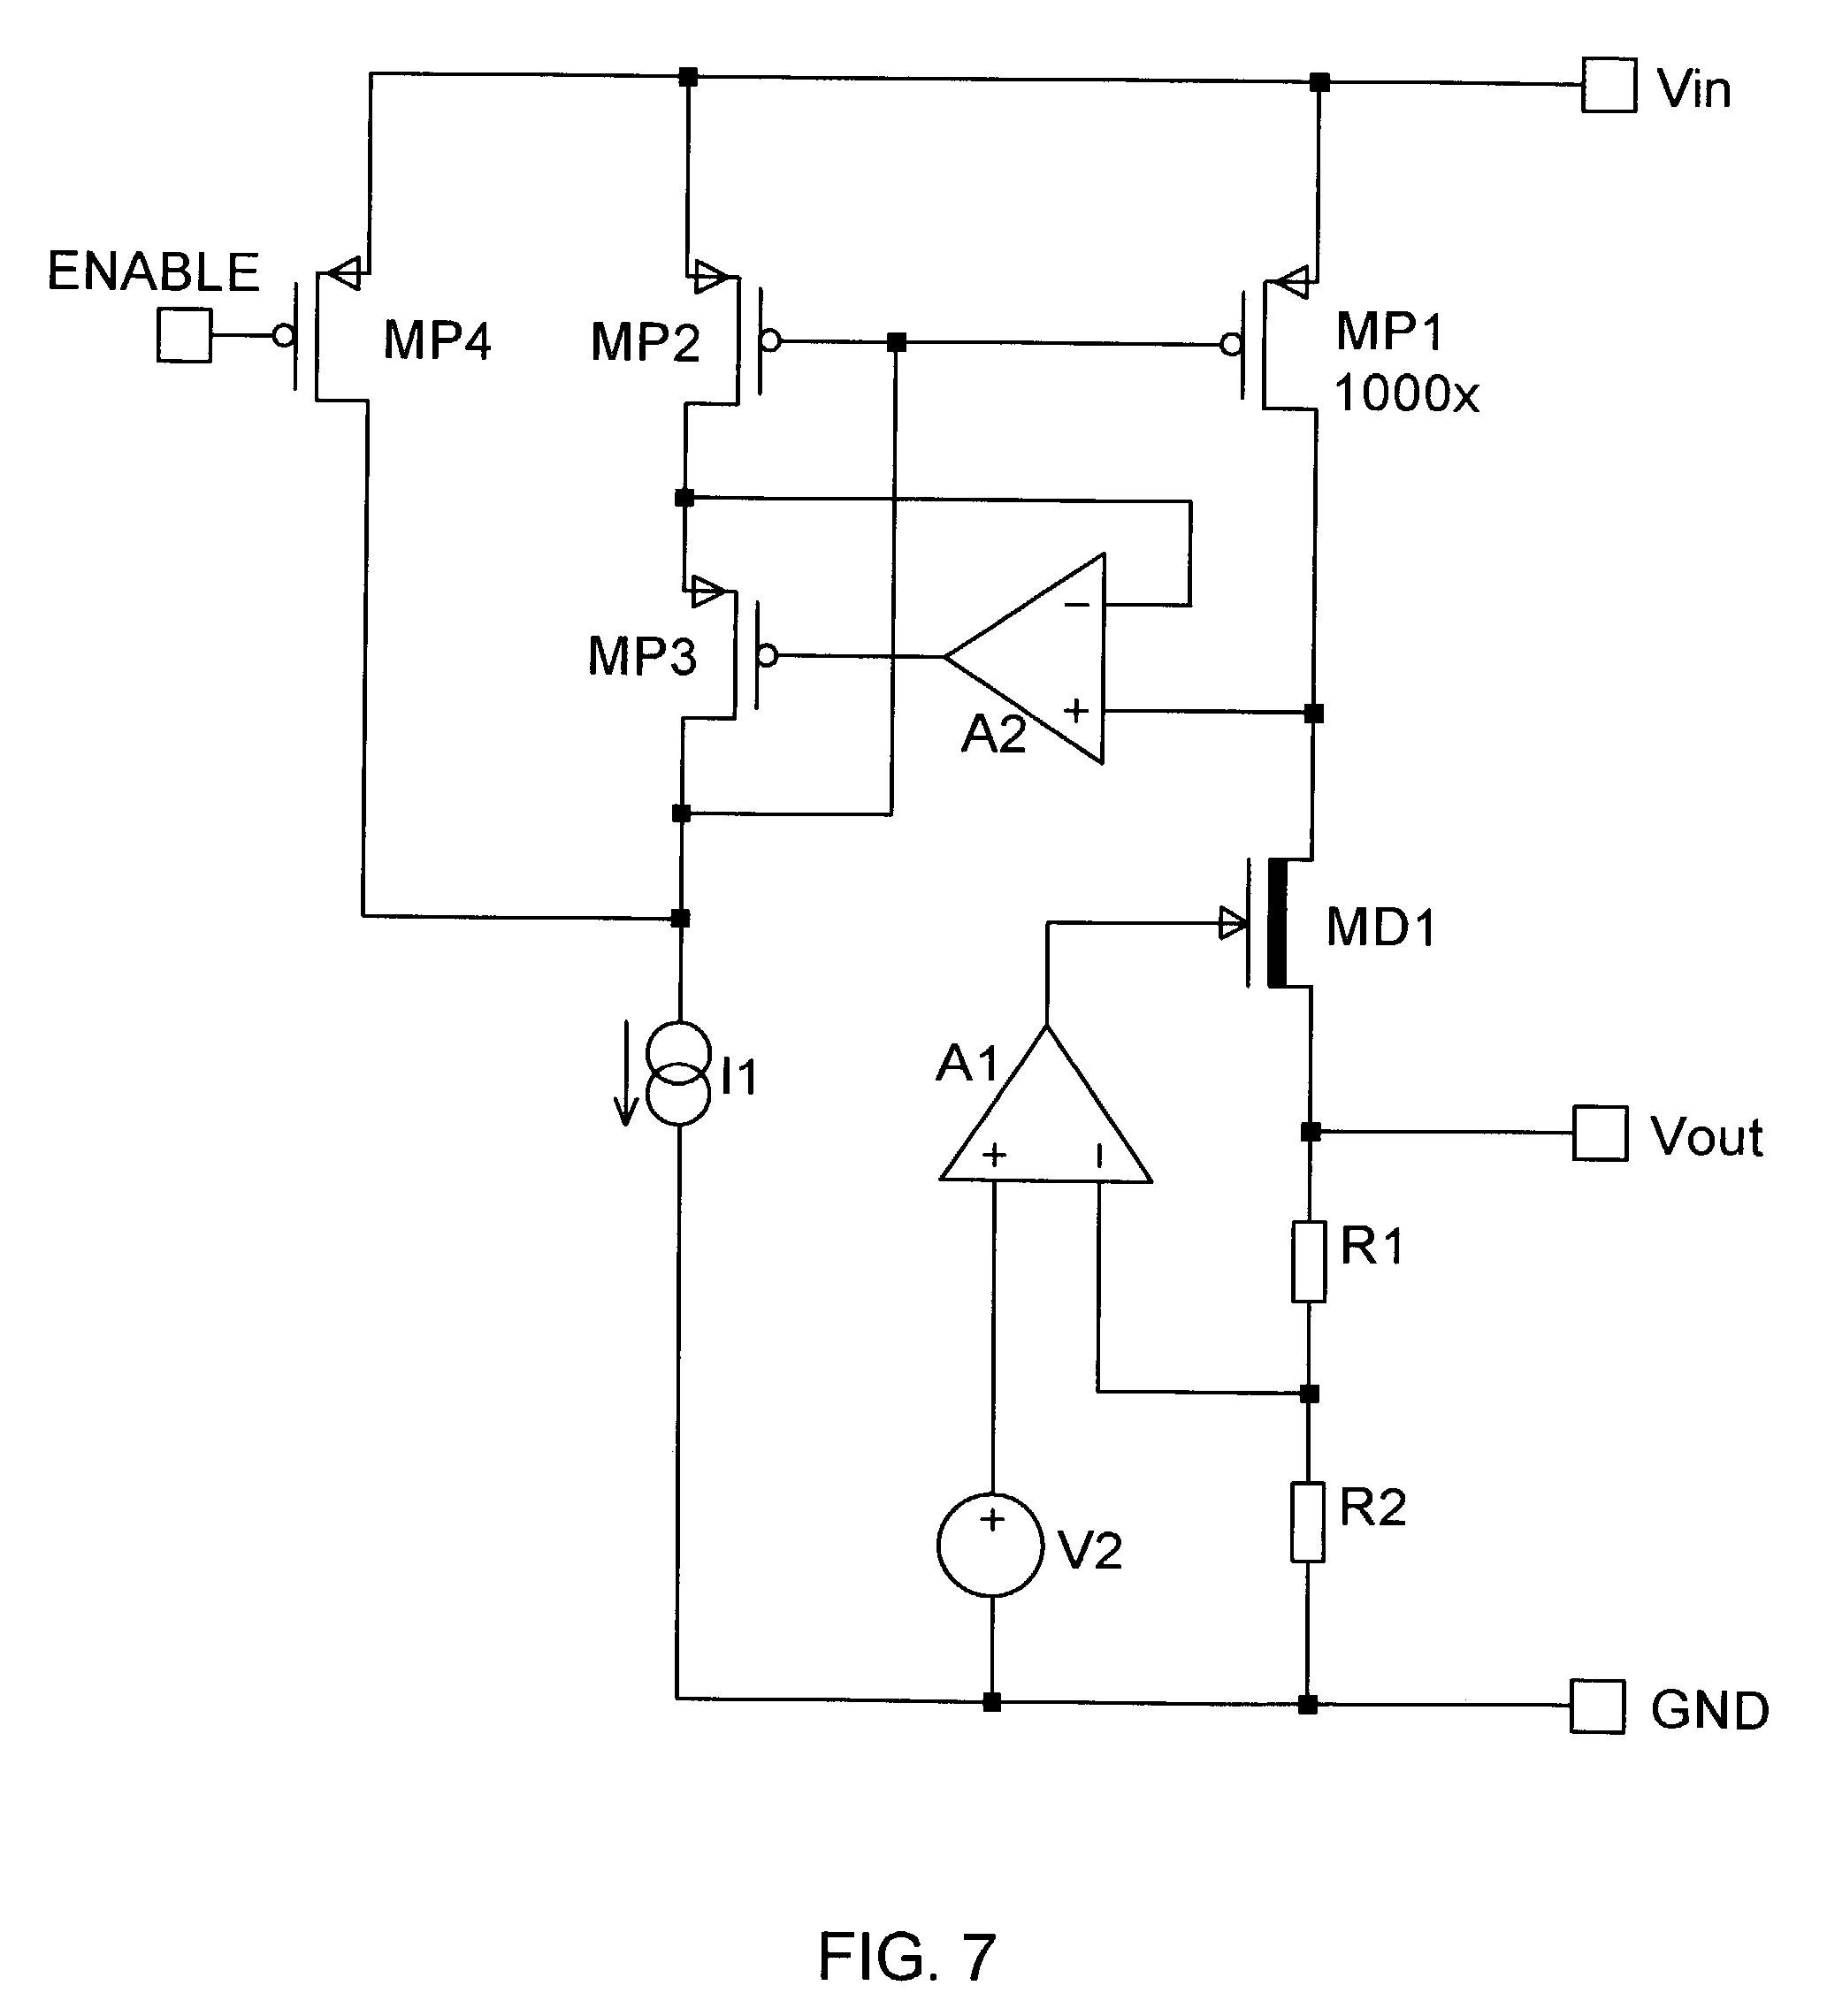 Gf 2341 Beetle Voltage Regulator Wiring Diagram Free Download Wiring Diagram Free Diagram